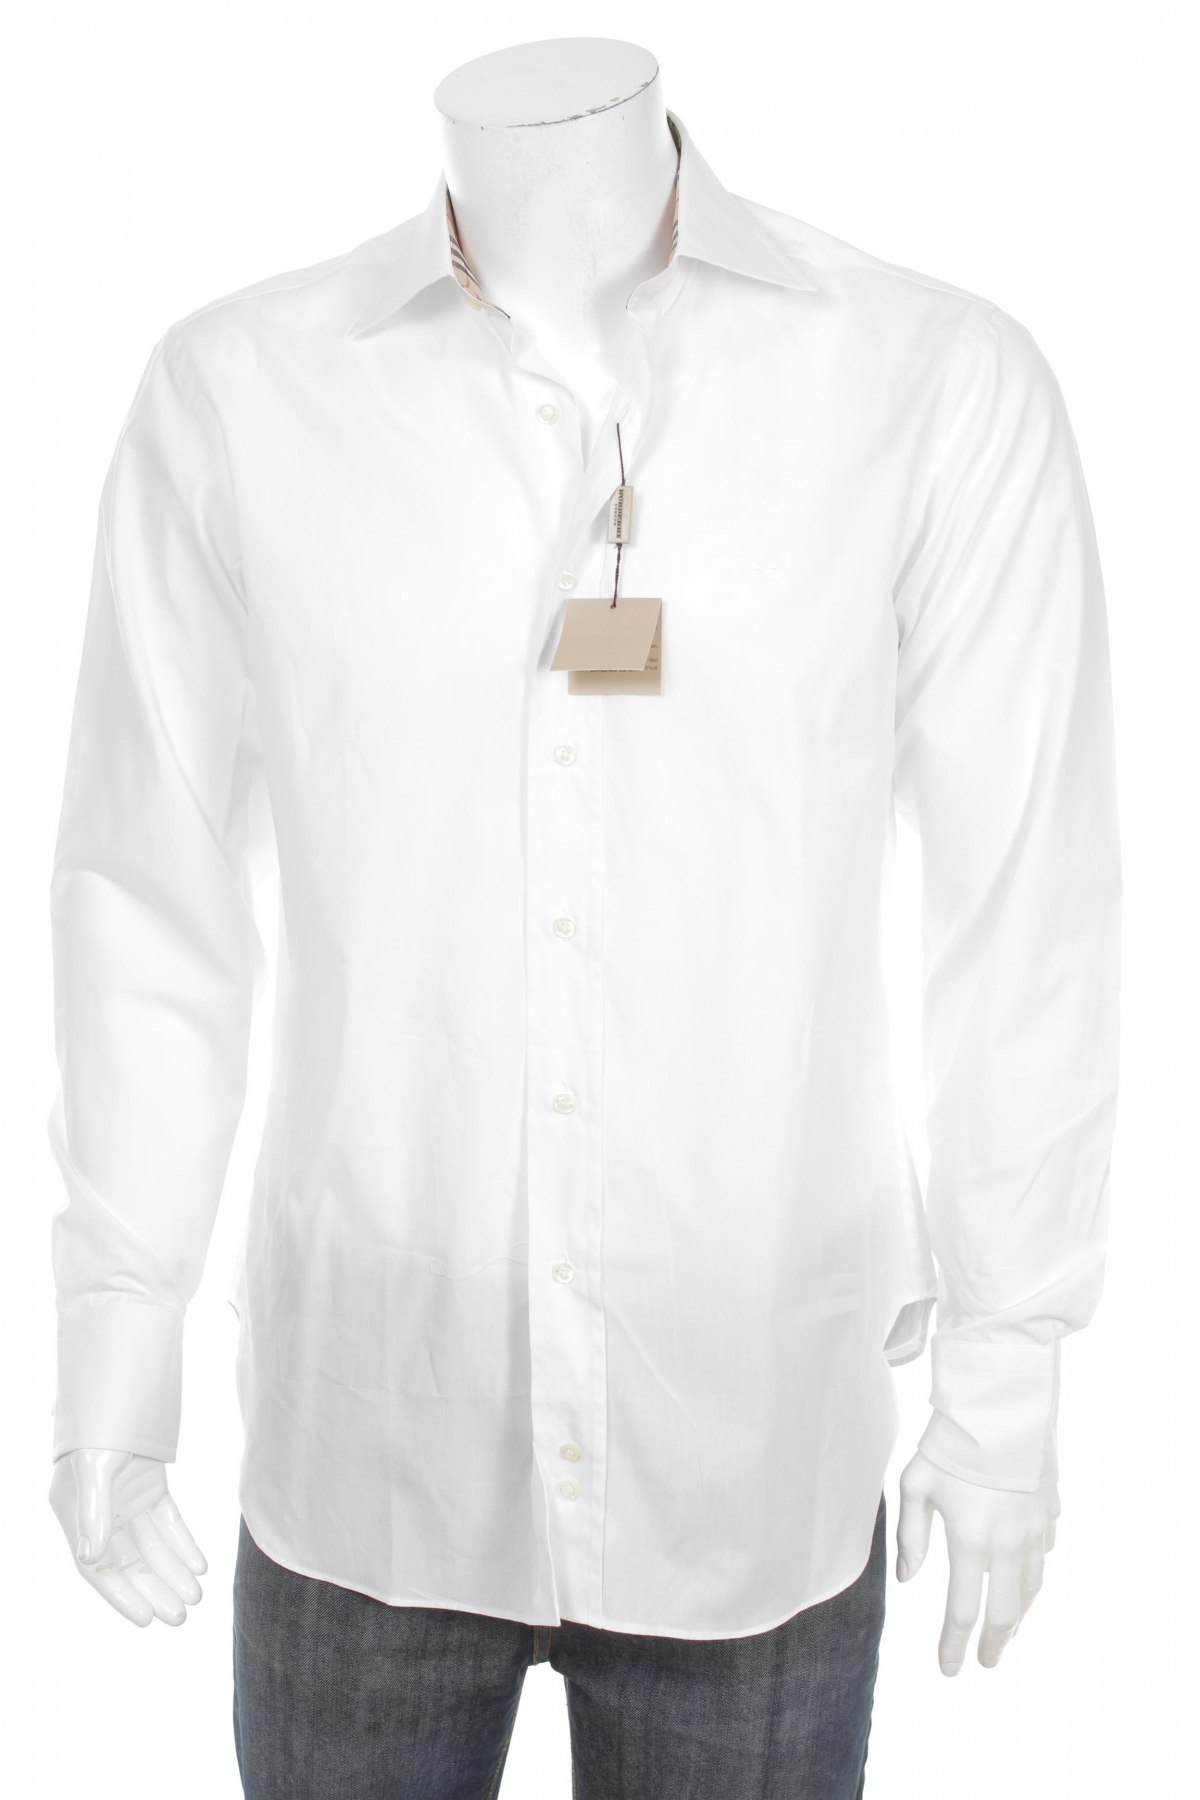 e710581e6c Ανδρικό πουκάμισο Burberry - σε συμφέρουσα τιμή στο Remix -  8672278